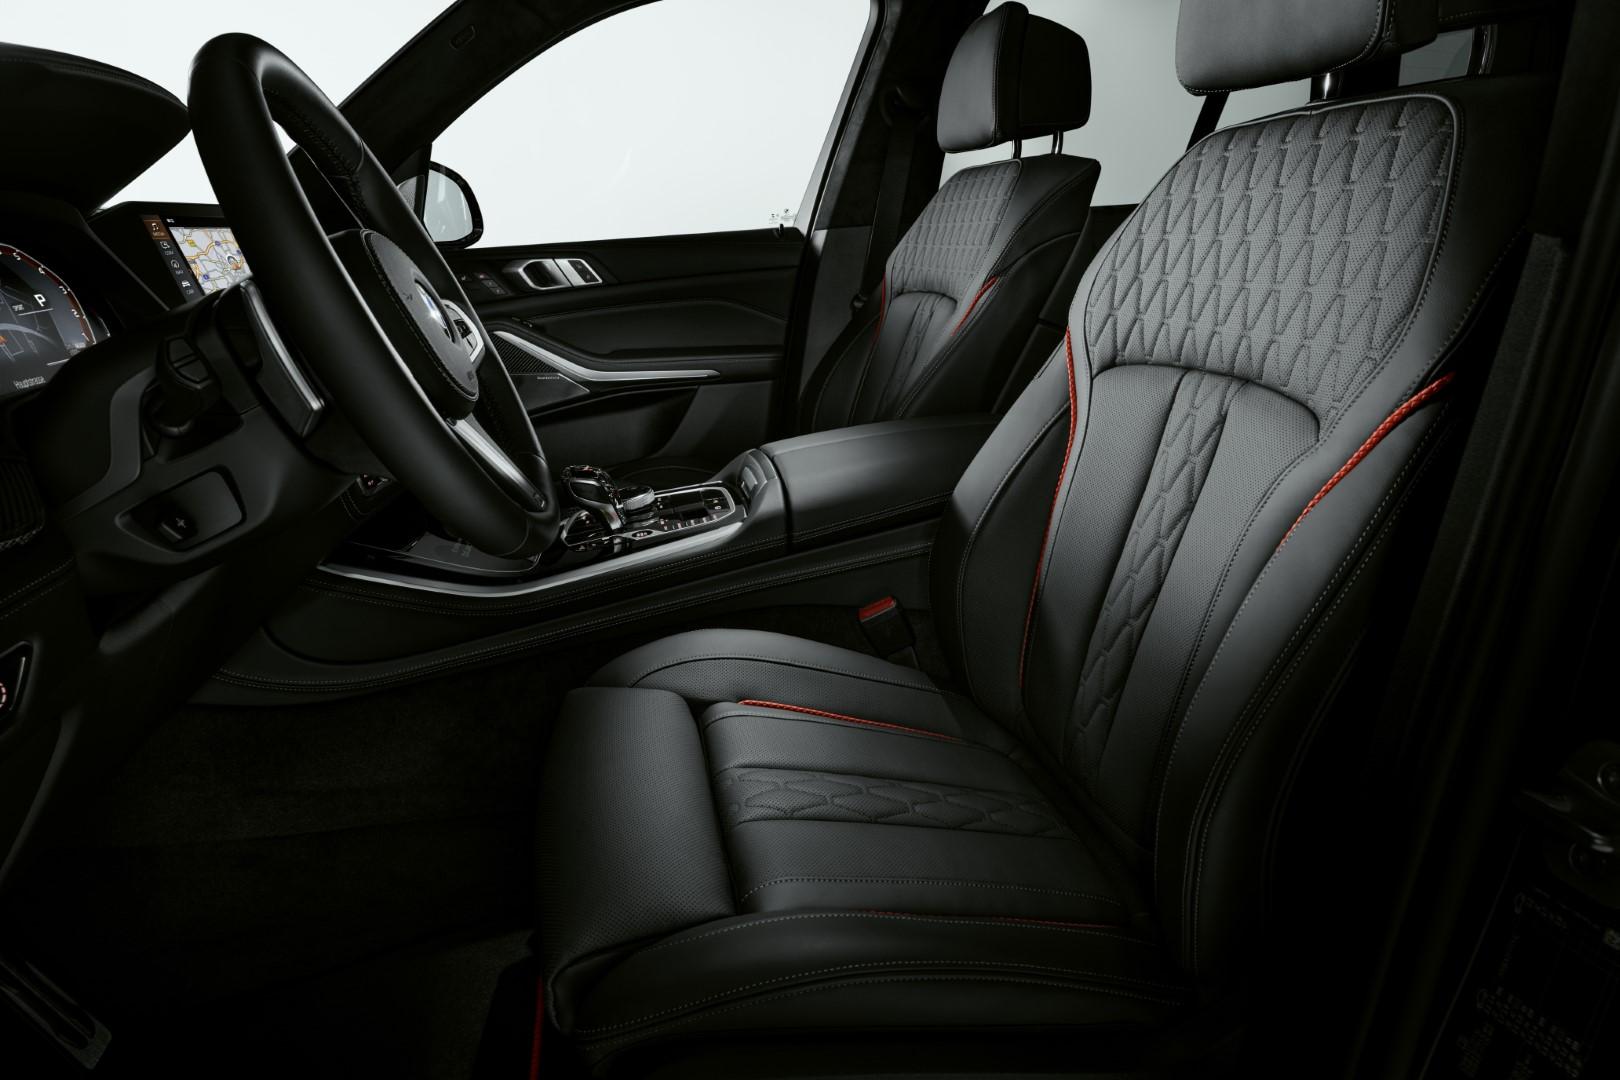 BMW X6 Black Vermilion